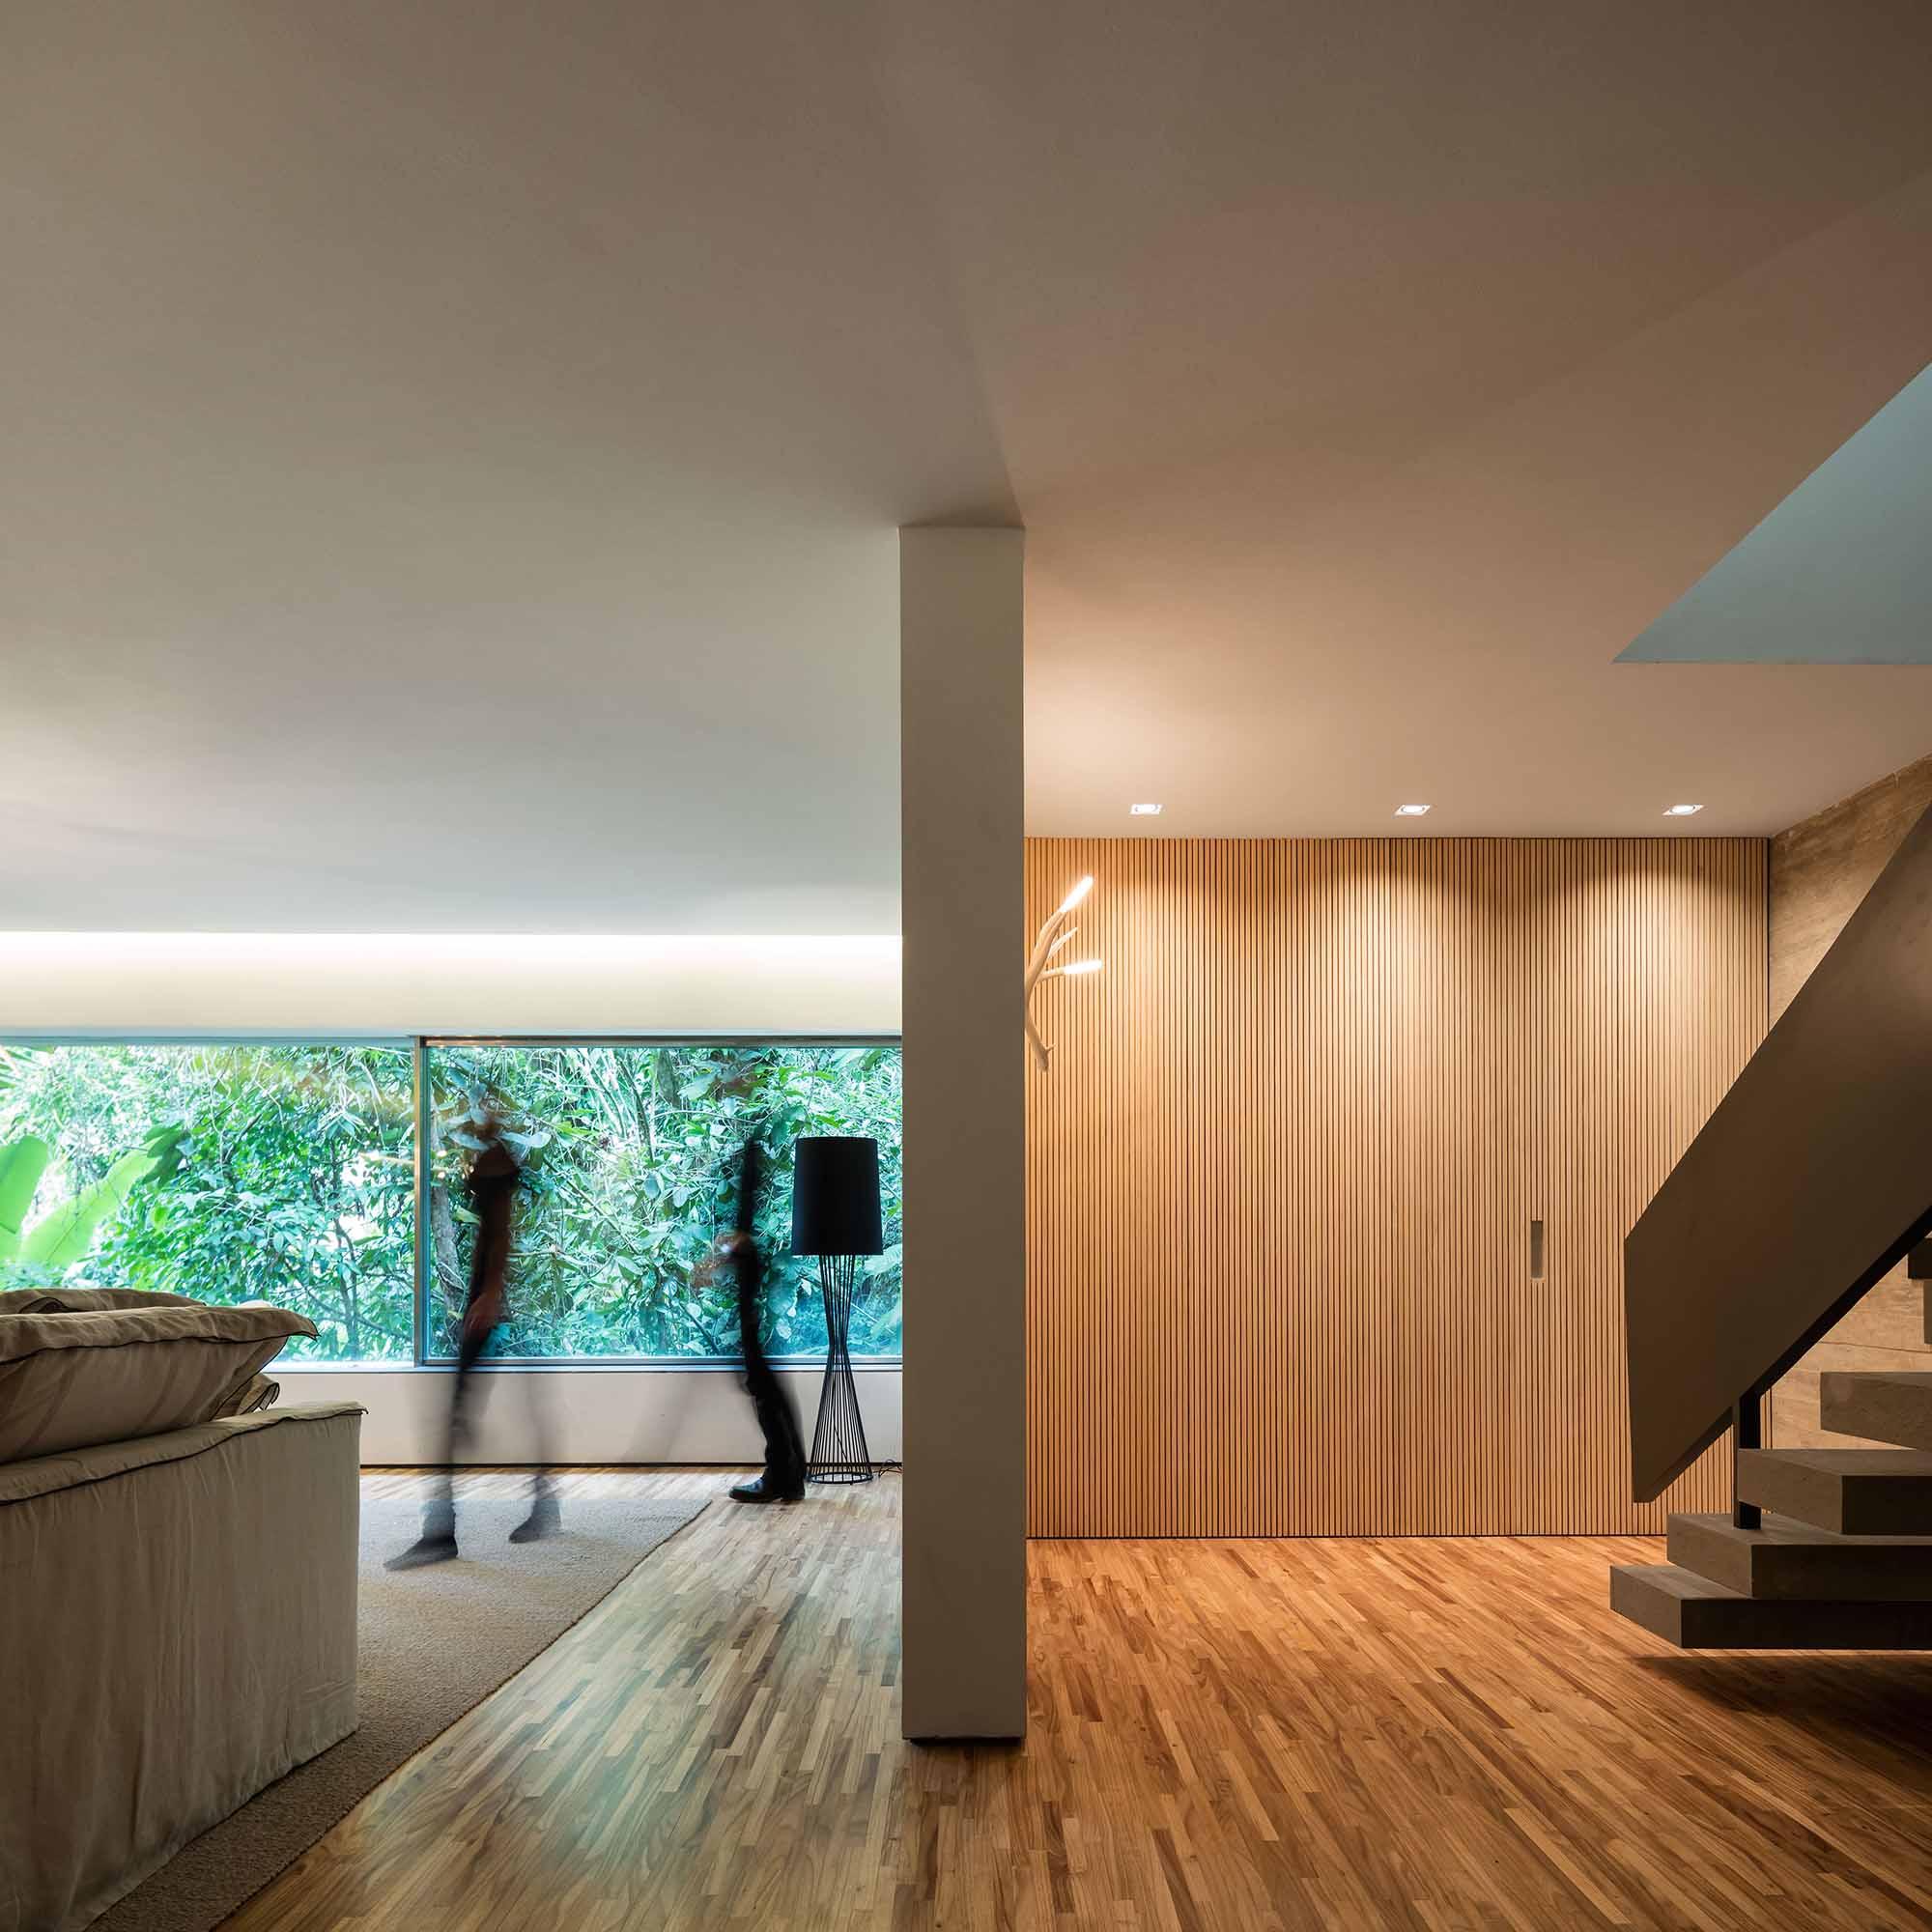 H-House-Life-Jungle-House-Casa-Da-Mata-studio-mk27-mk27_namata_fernandoguerra_medium(21).JPG